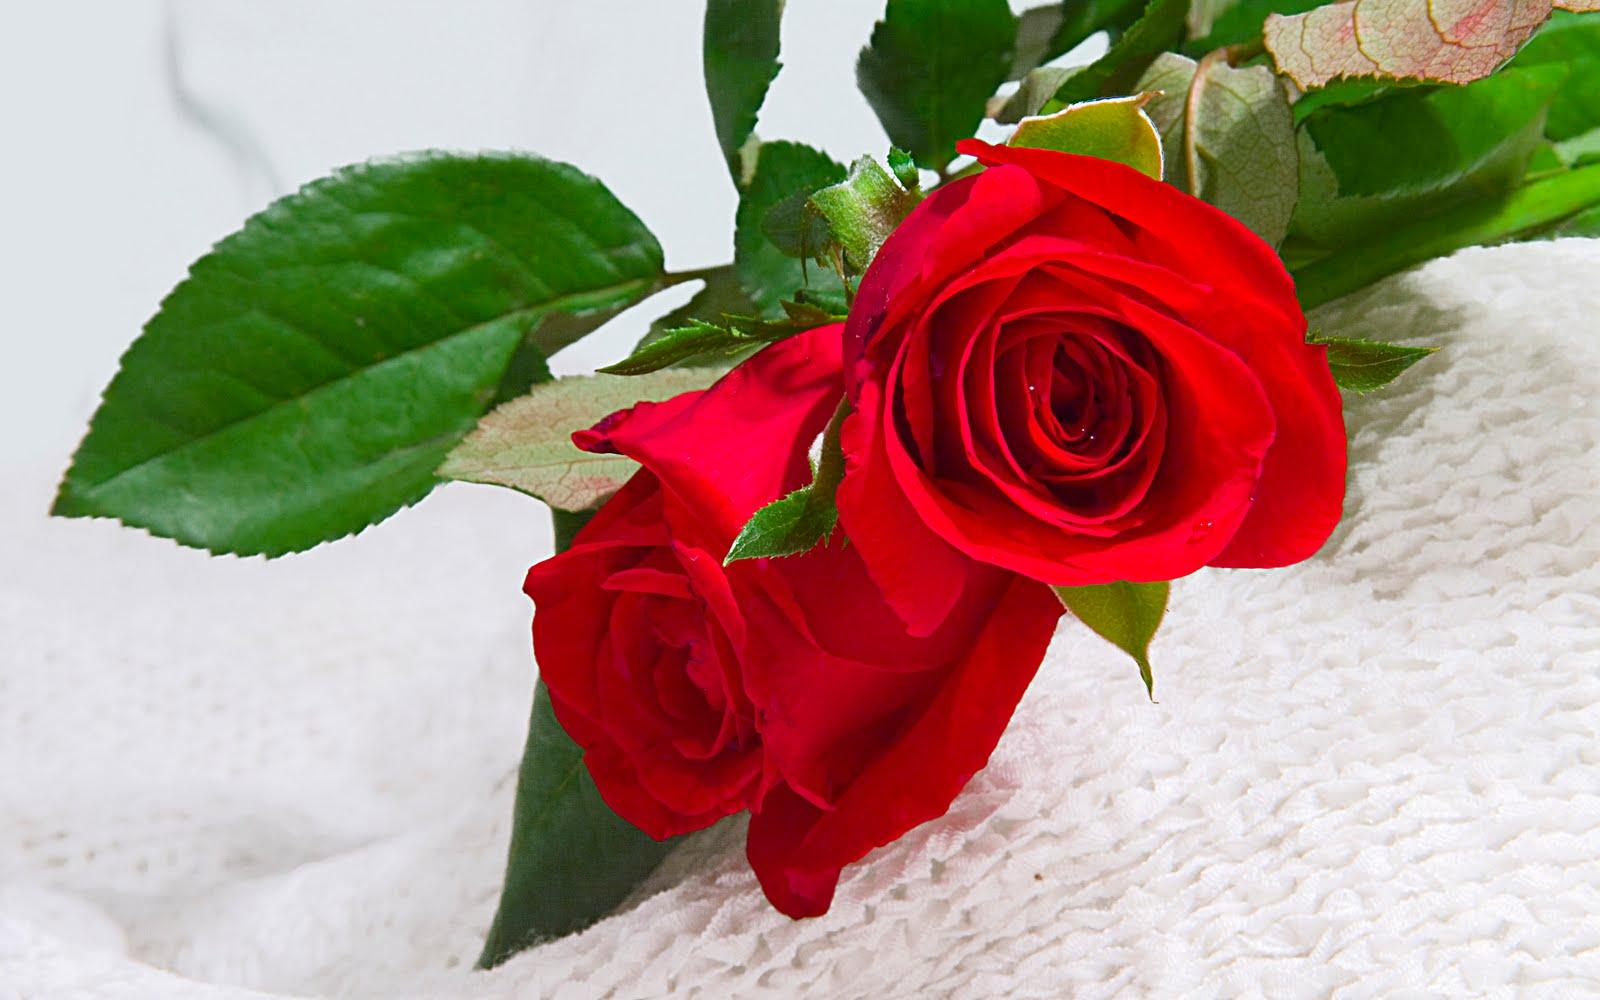 Red roses wallpaper | Wallpaper Wide HD